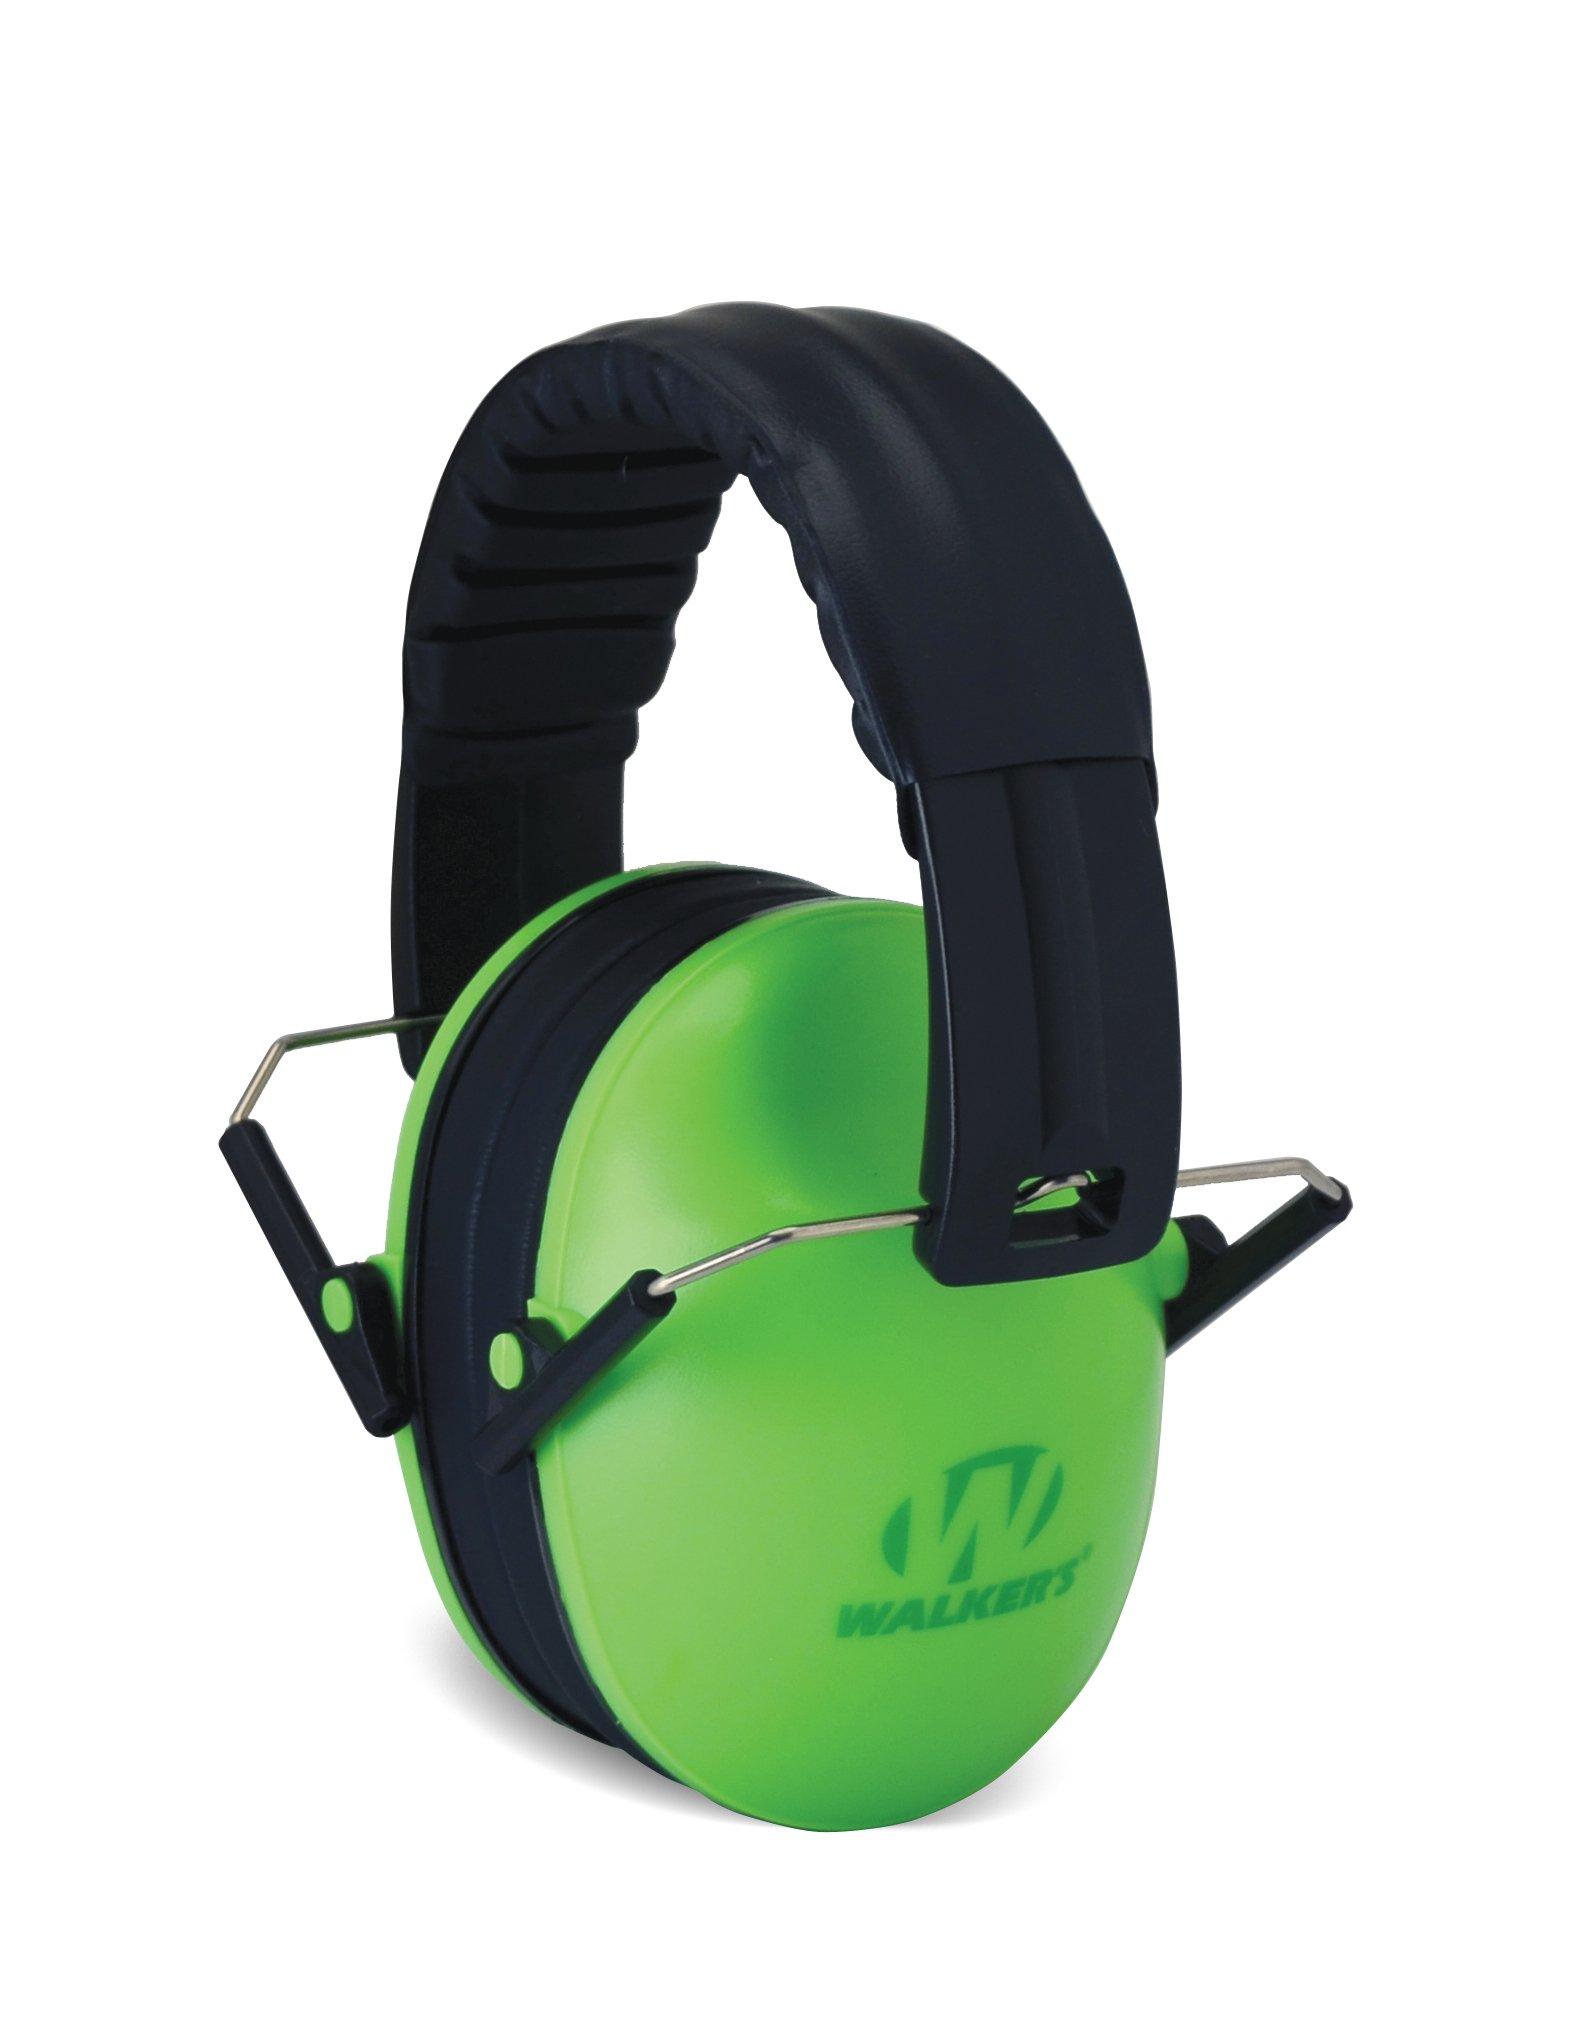 Walker's Children-Baby & Kids Hearing Protection/Folding Ear Muff, Lime Green by Walker's Game Ear